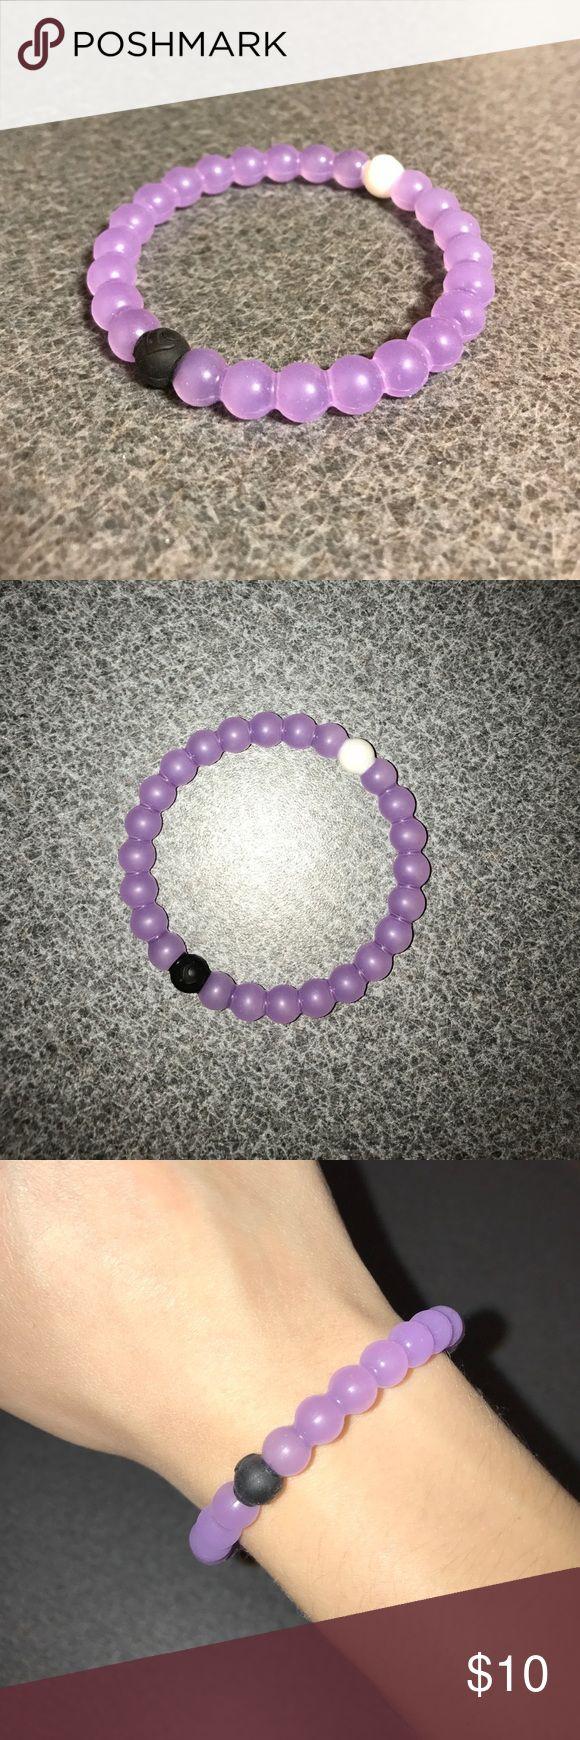 Purple Lokai Bracelet Gently used. In great condition! Size M. Lokai Jewelry Bracelets